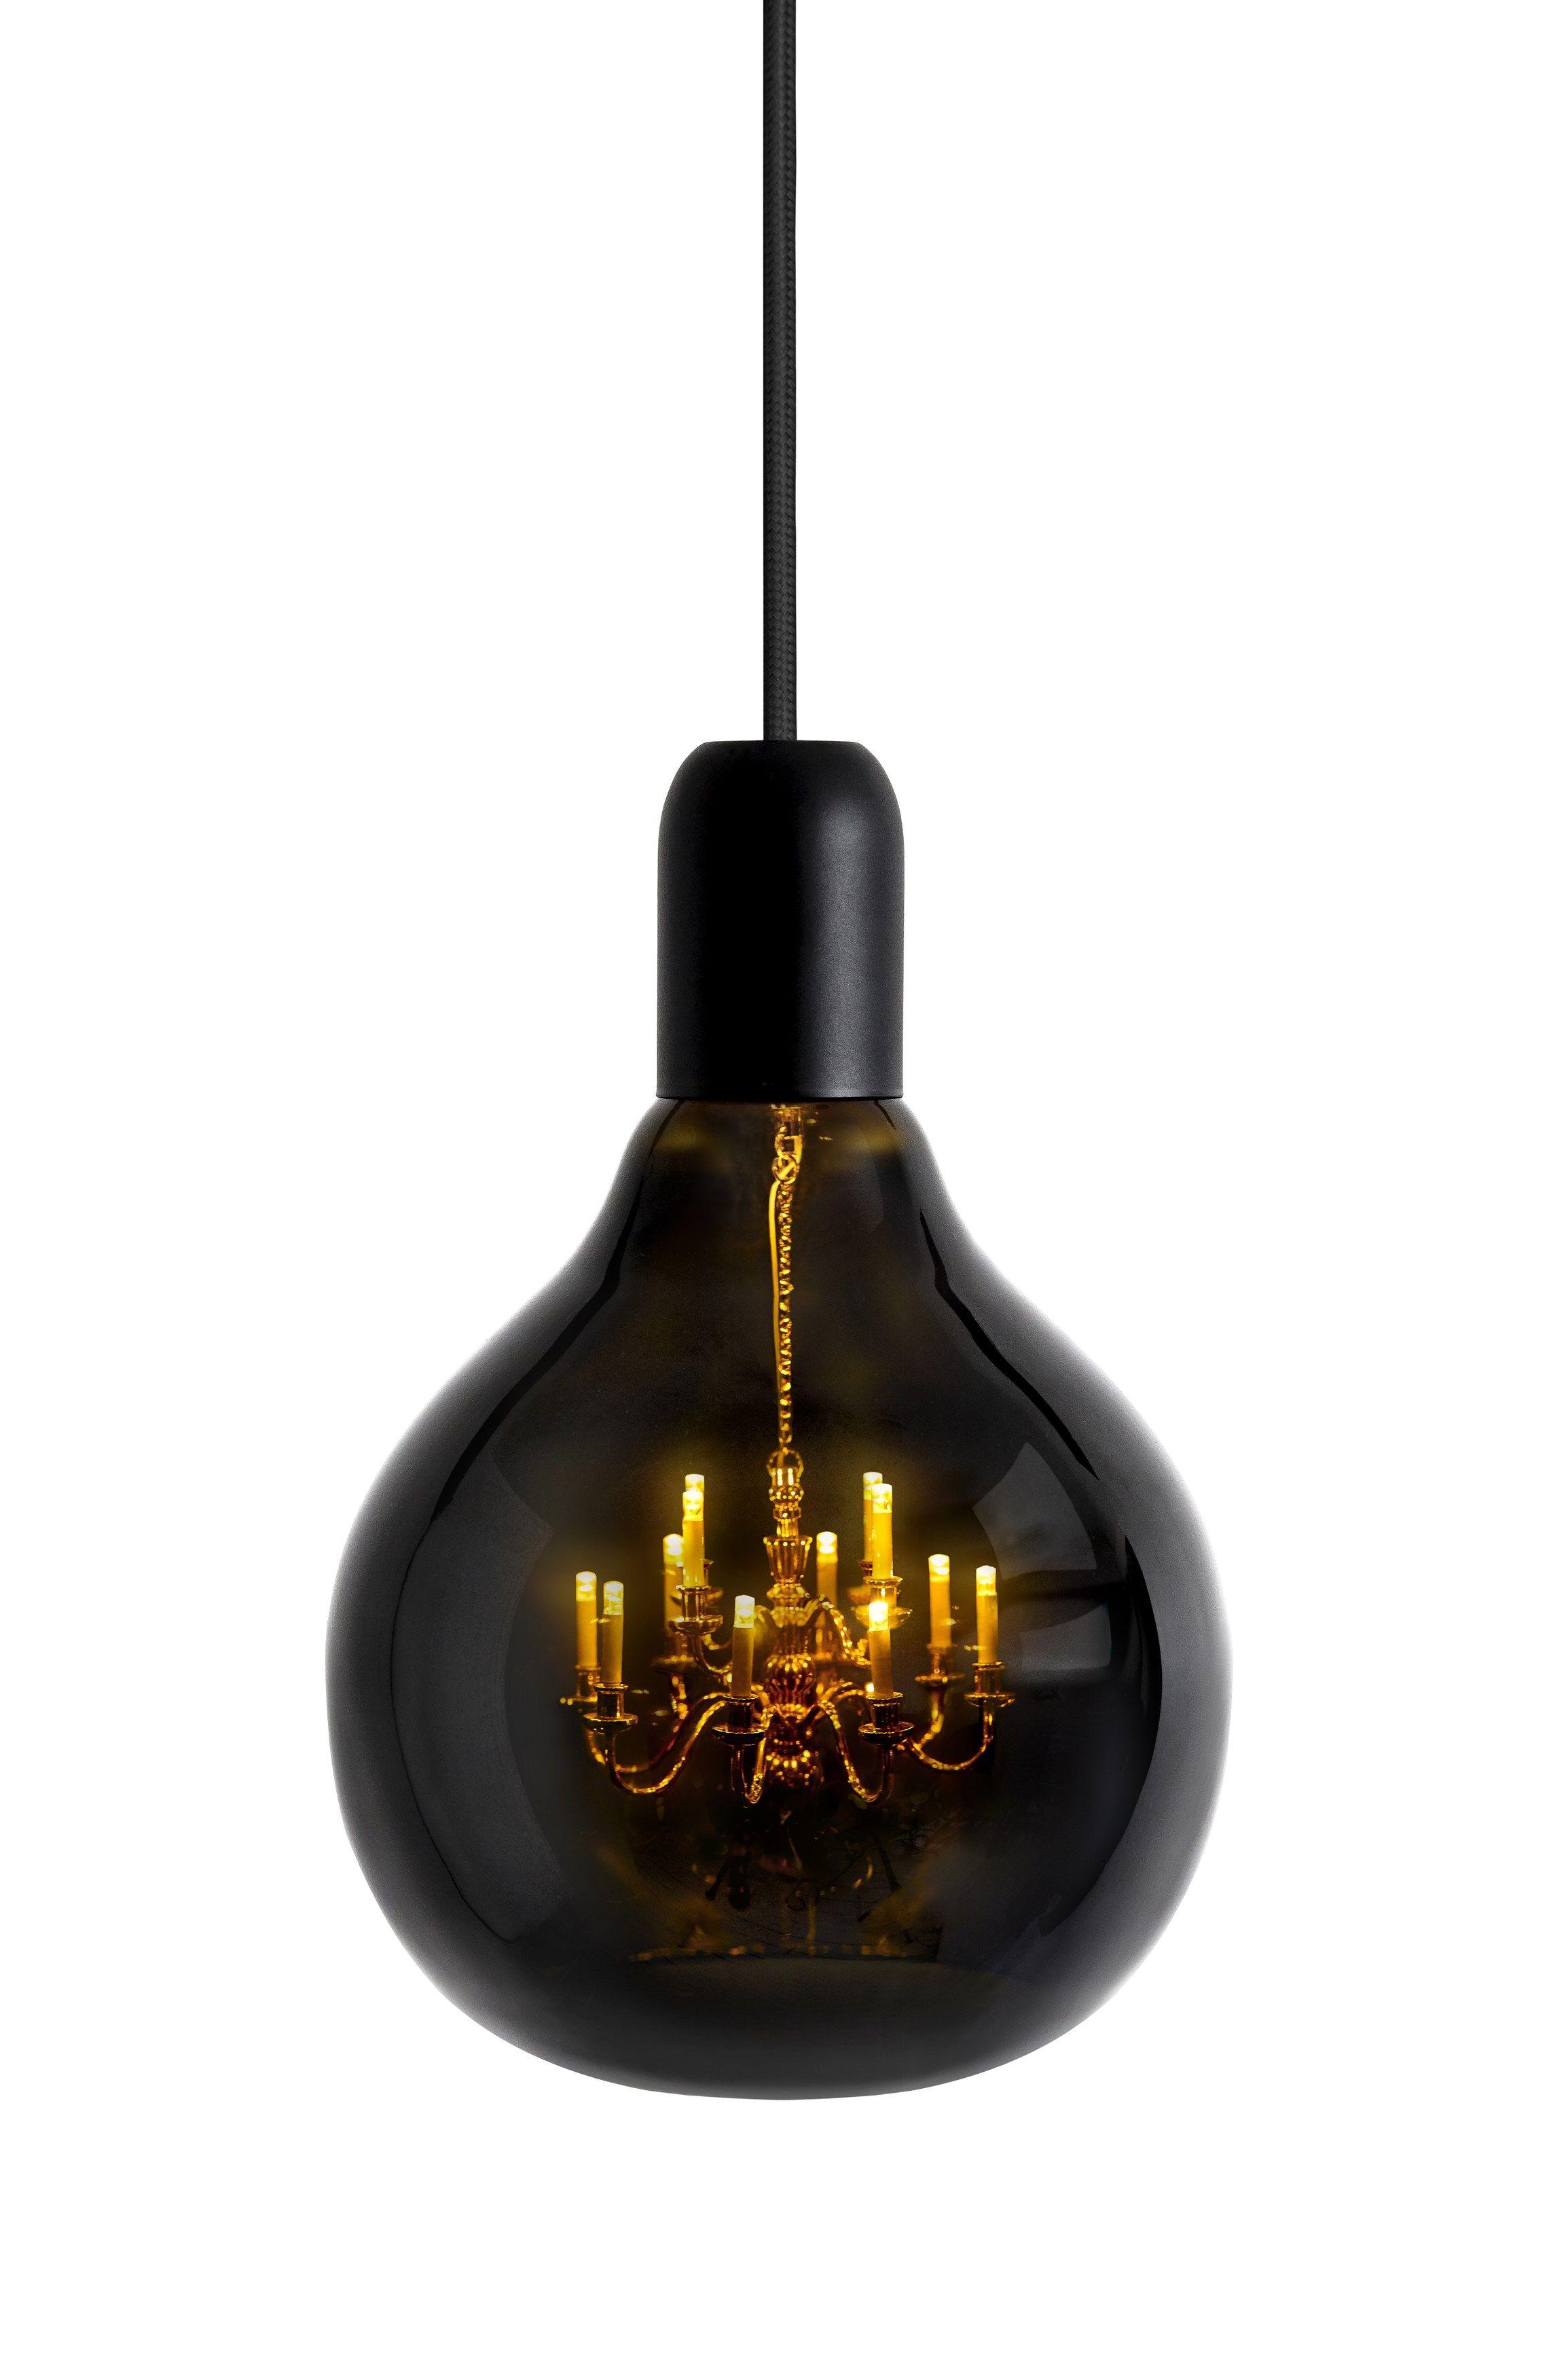 Captivating Blown Glass Pendant Lamp KING EDISON GHOST   @lovabledesign Great Ideas